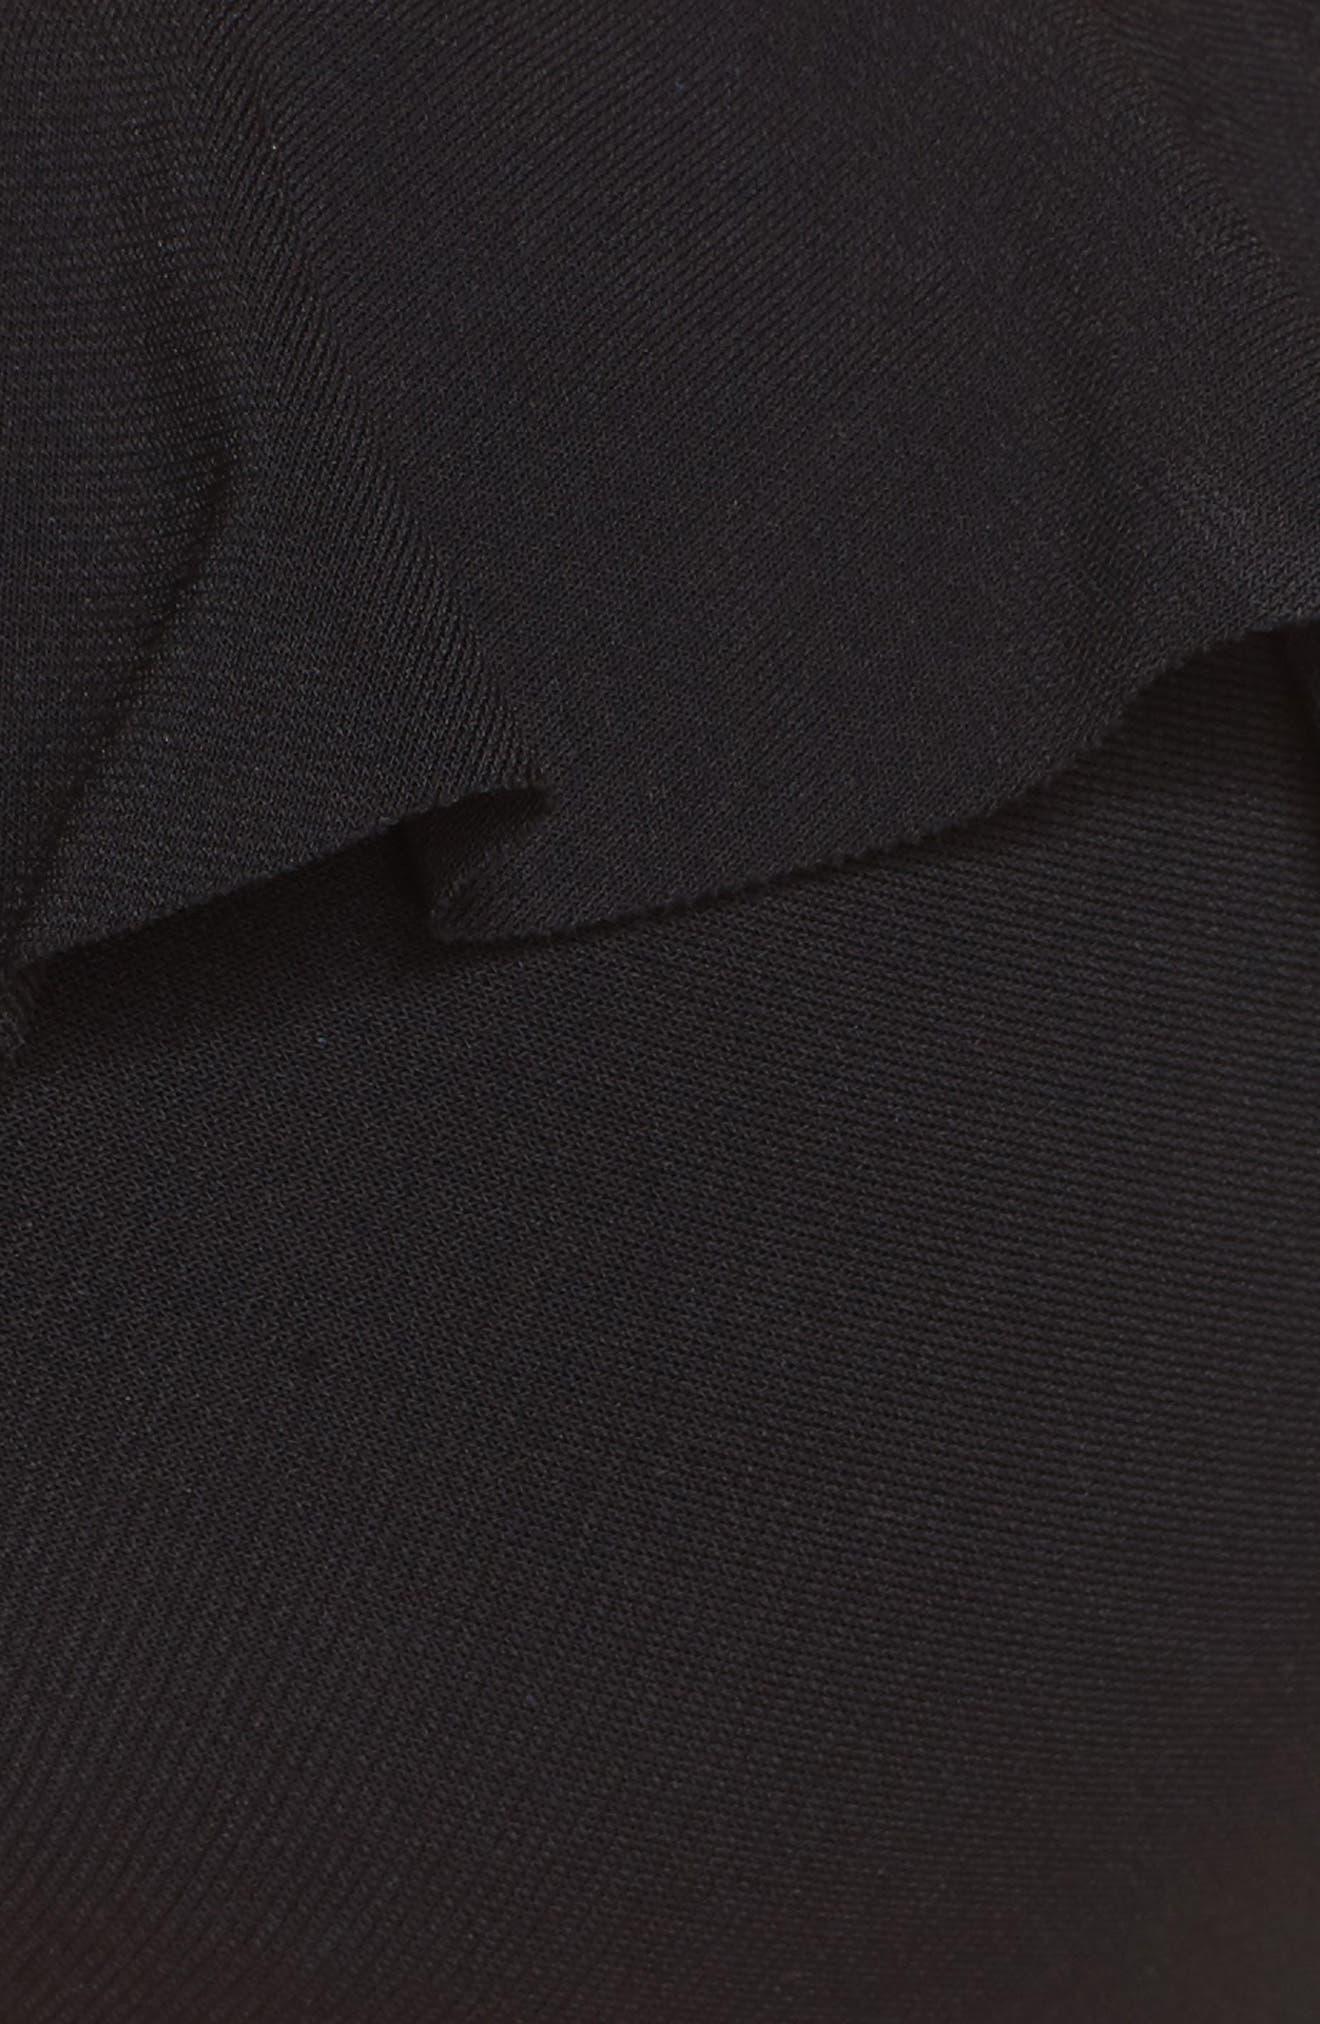 Lina Ruffle Bandeau Bikini Top,                             Alternate thumbnail 6, color,                             Black